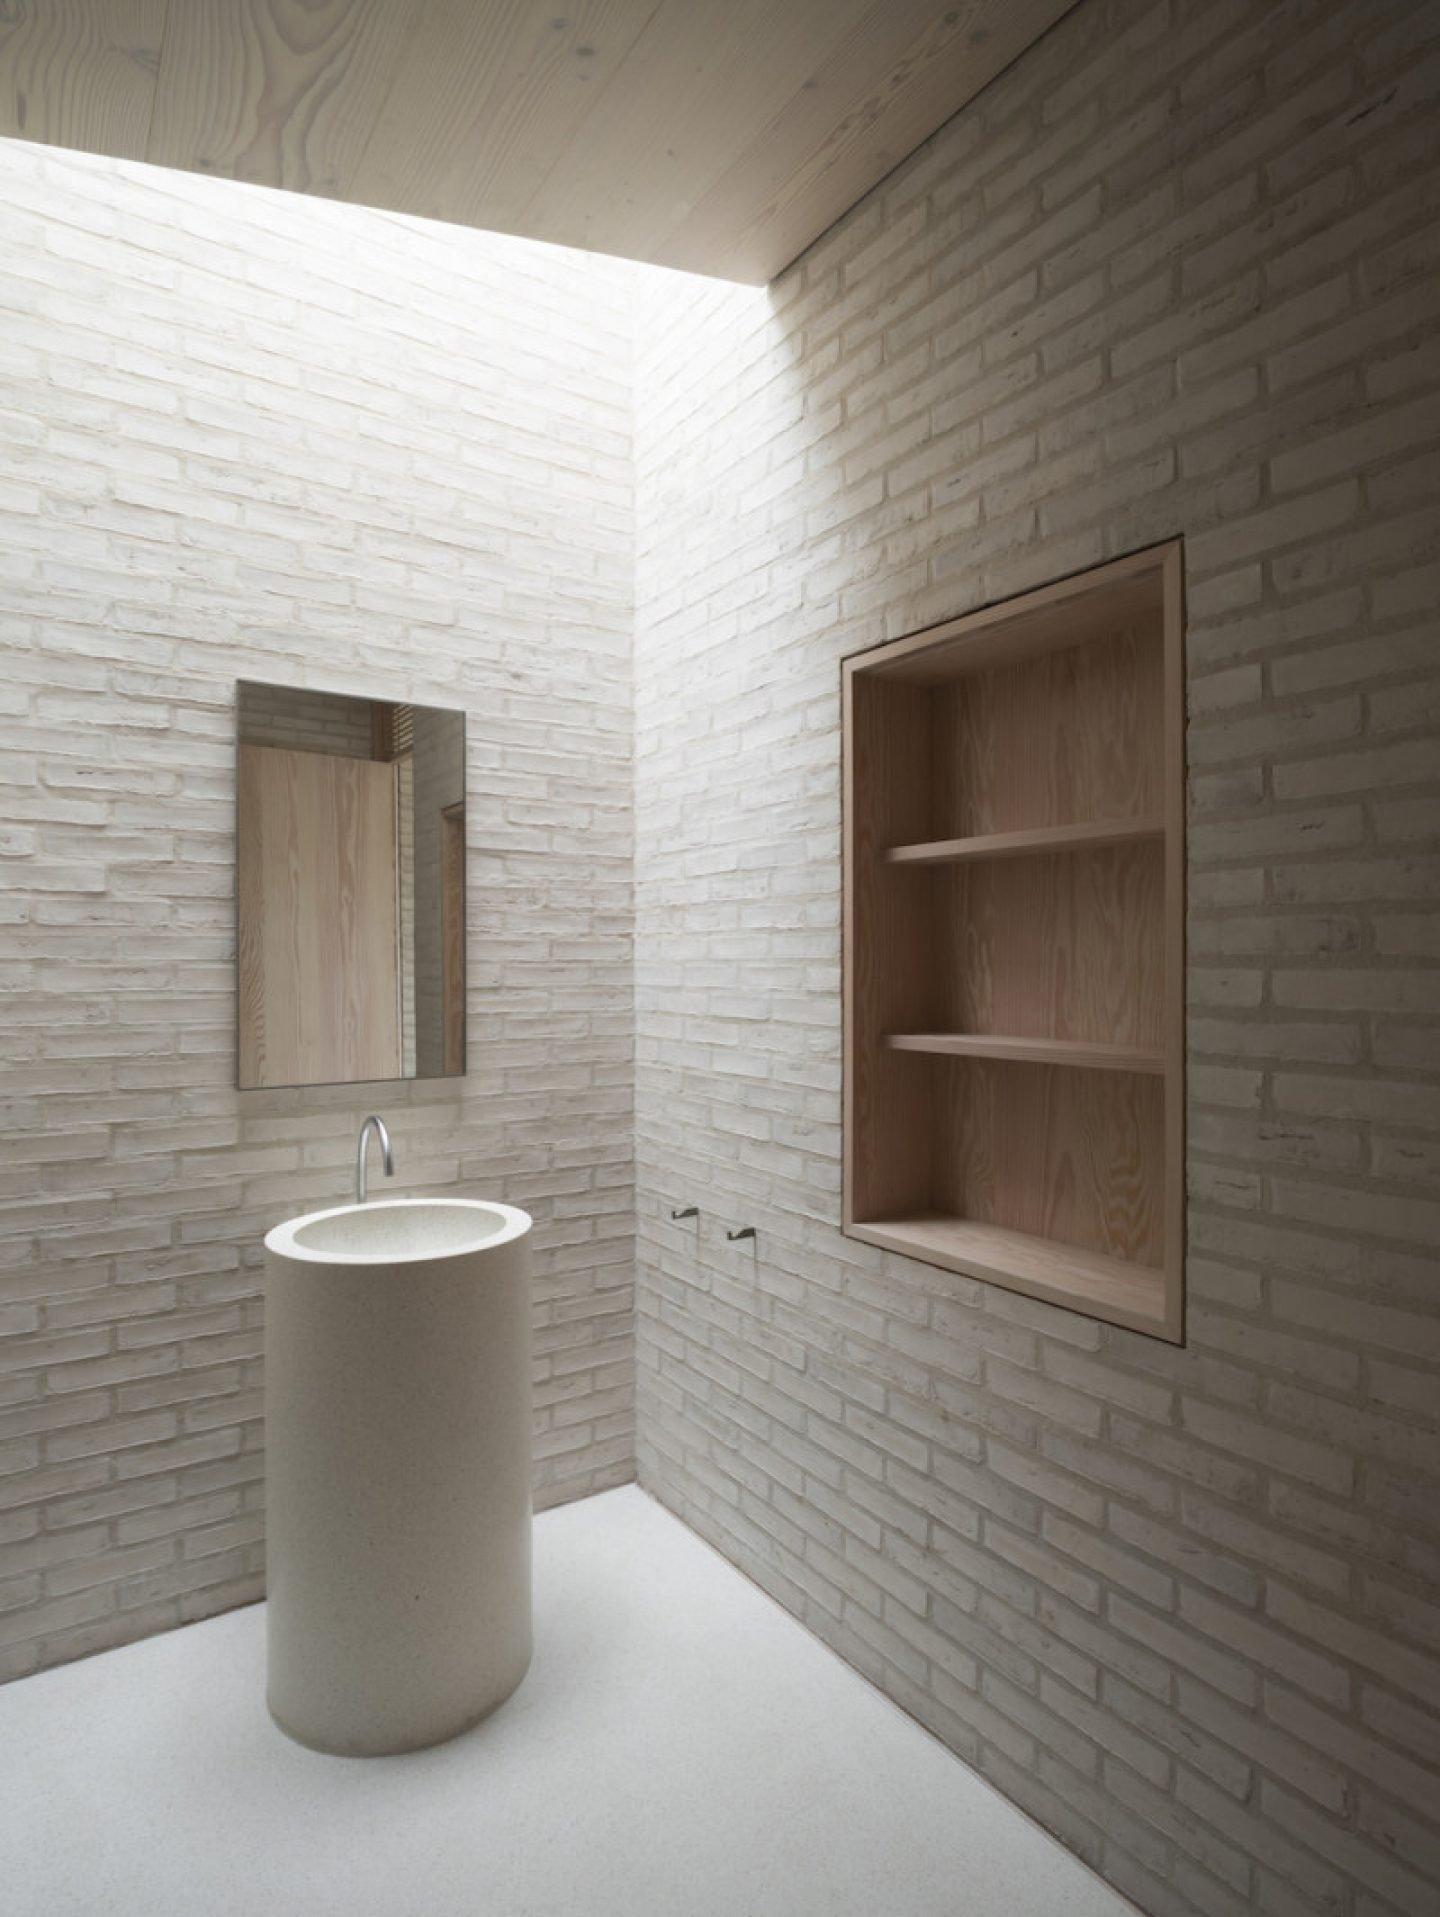 John_Pawson_Architecture__051